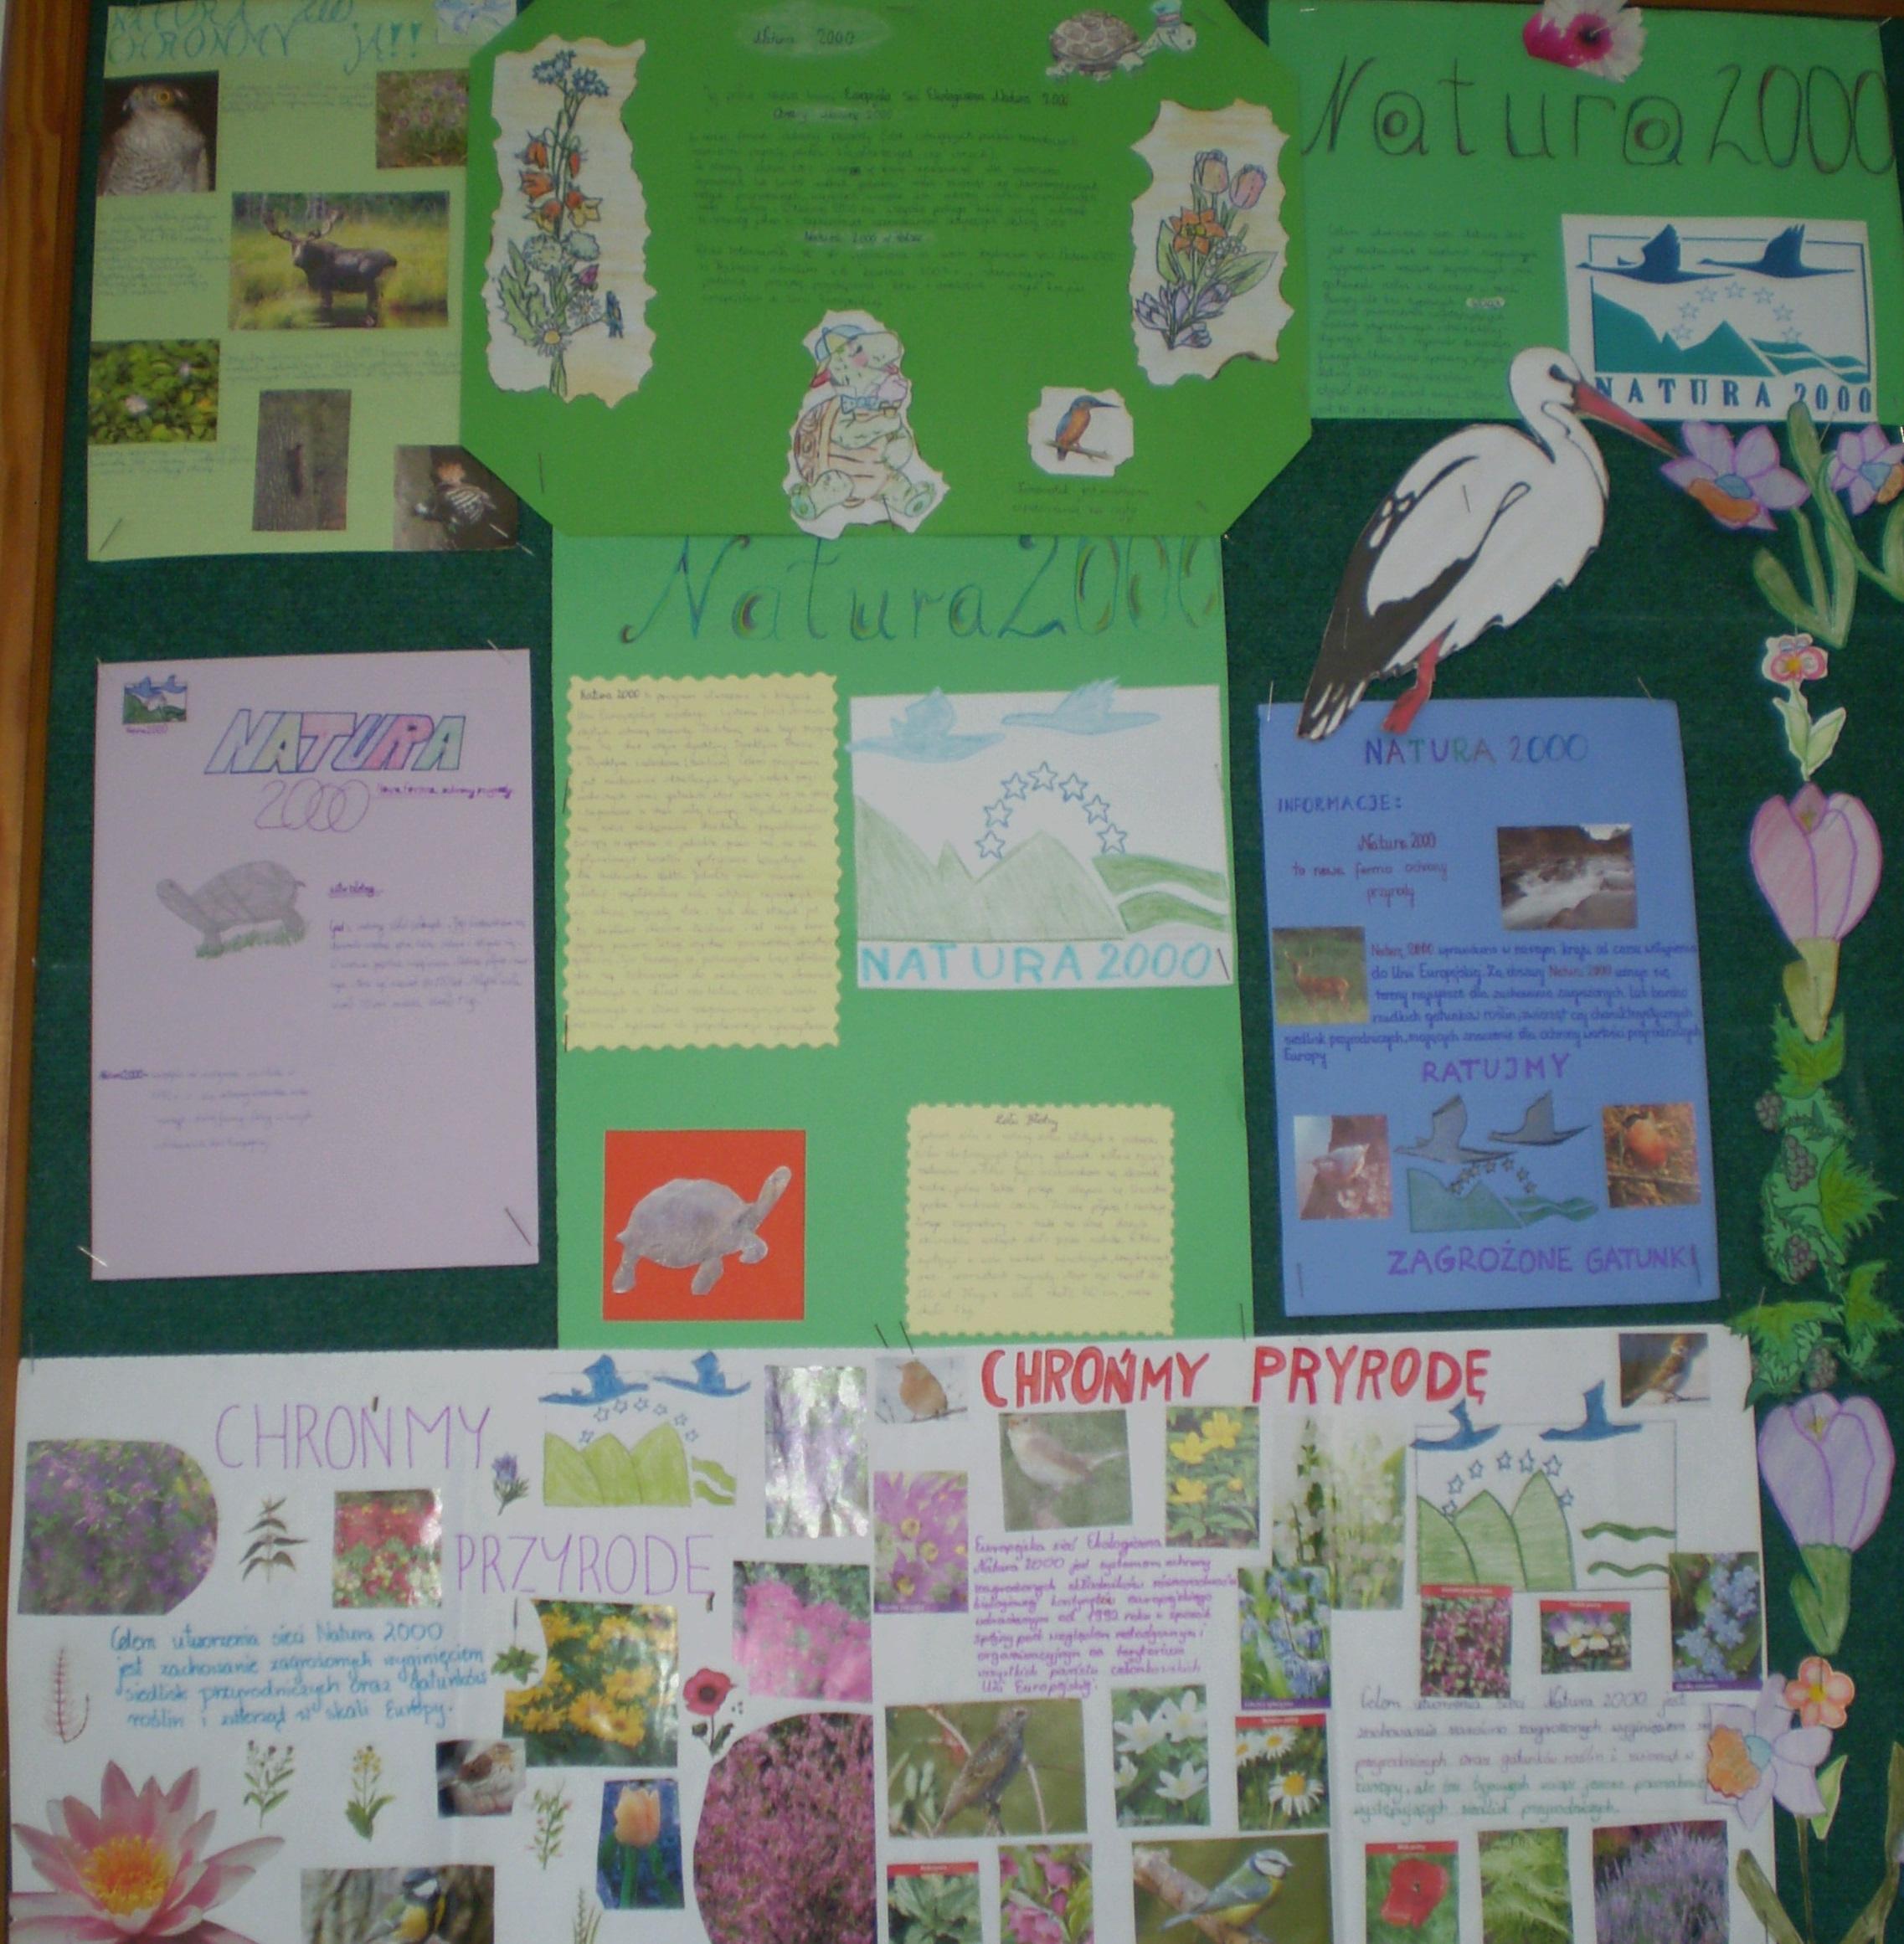 Natura 2000 I Inne Formy Ochrony Przyrody U źródeł Natury